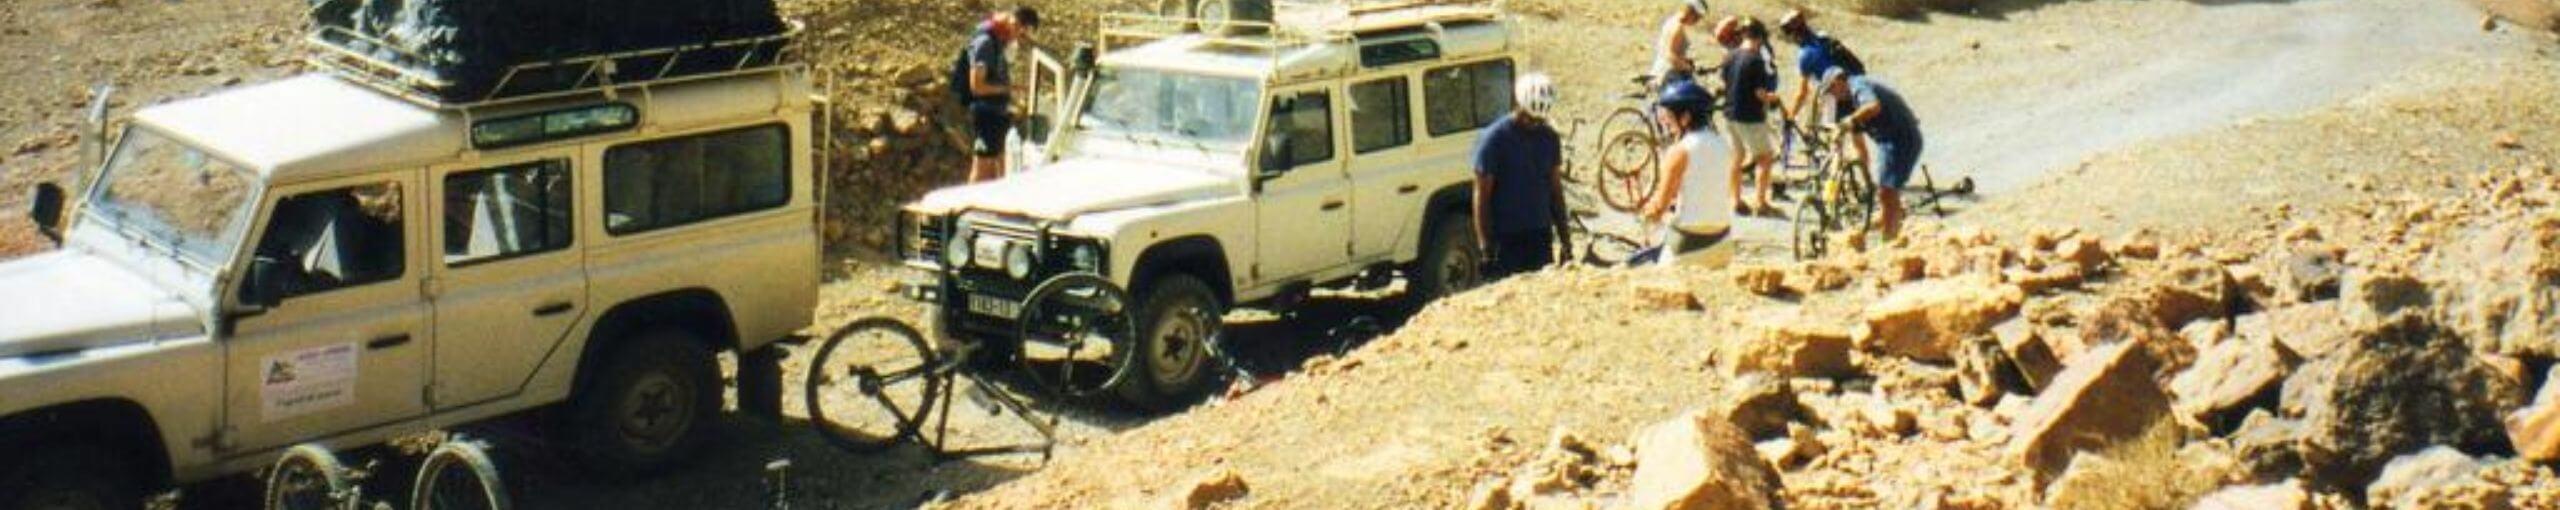 Aventuras en Marruecos.